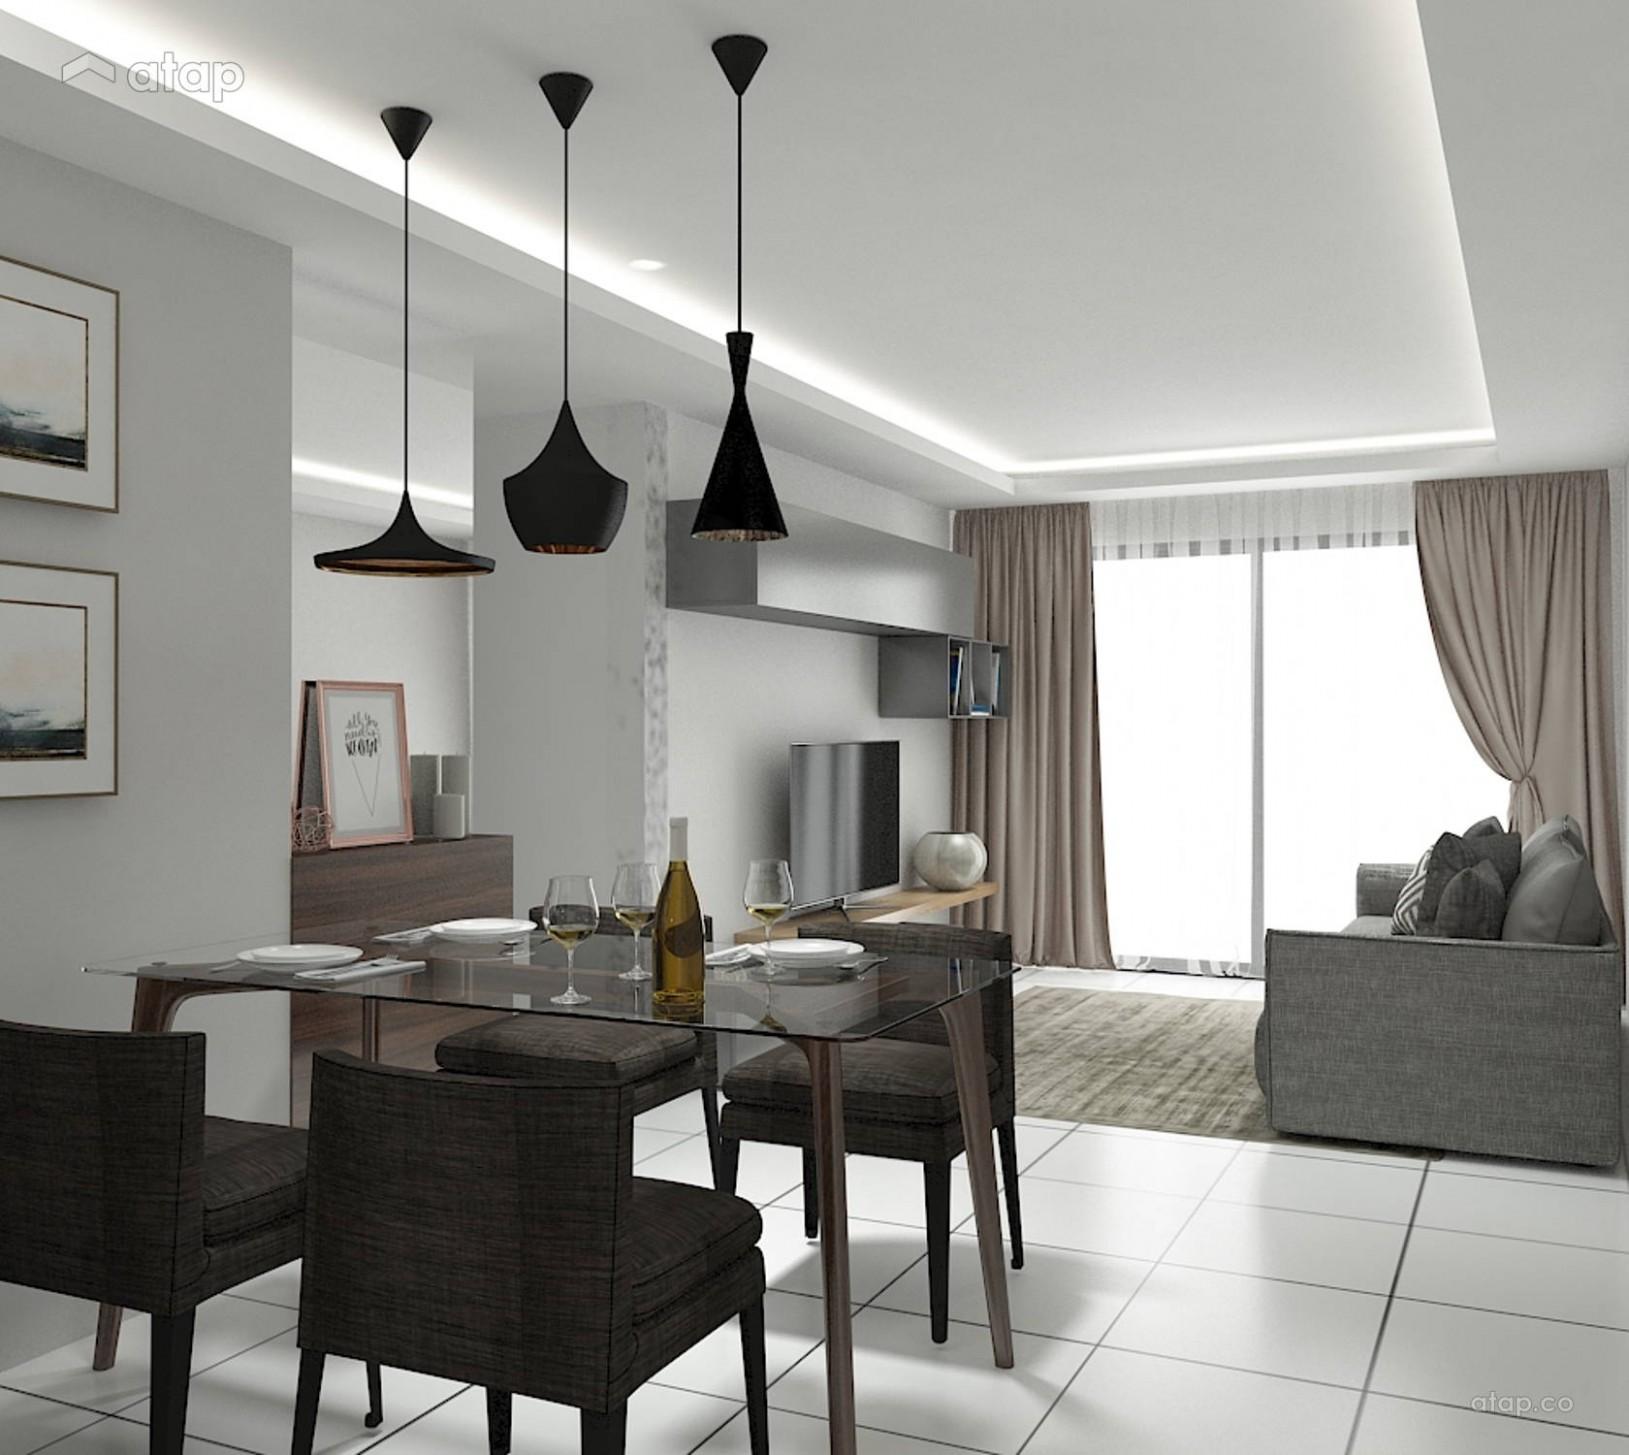 Refurbish old apartment interior design renovation ideas, photos  - Apartment Design Malaysia